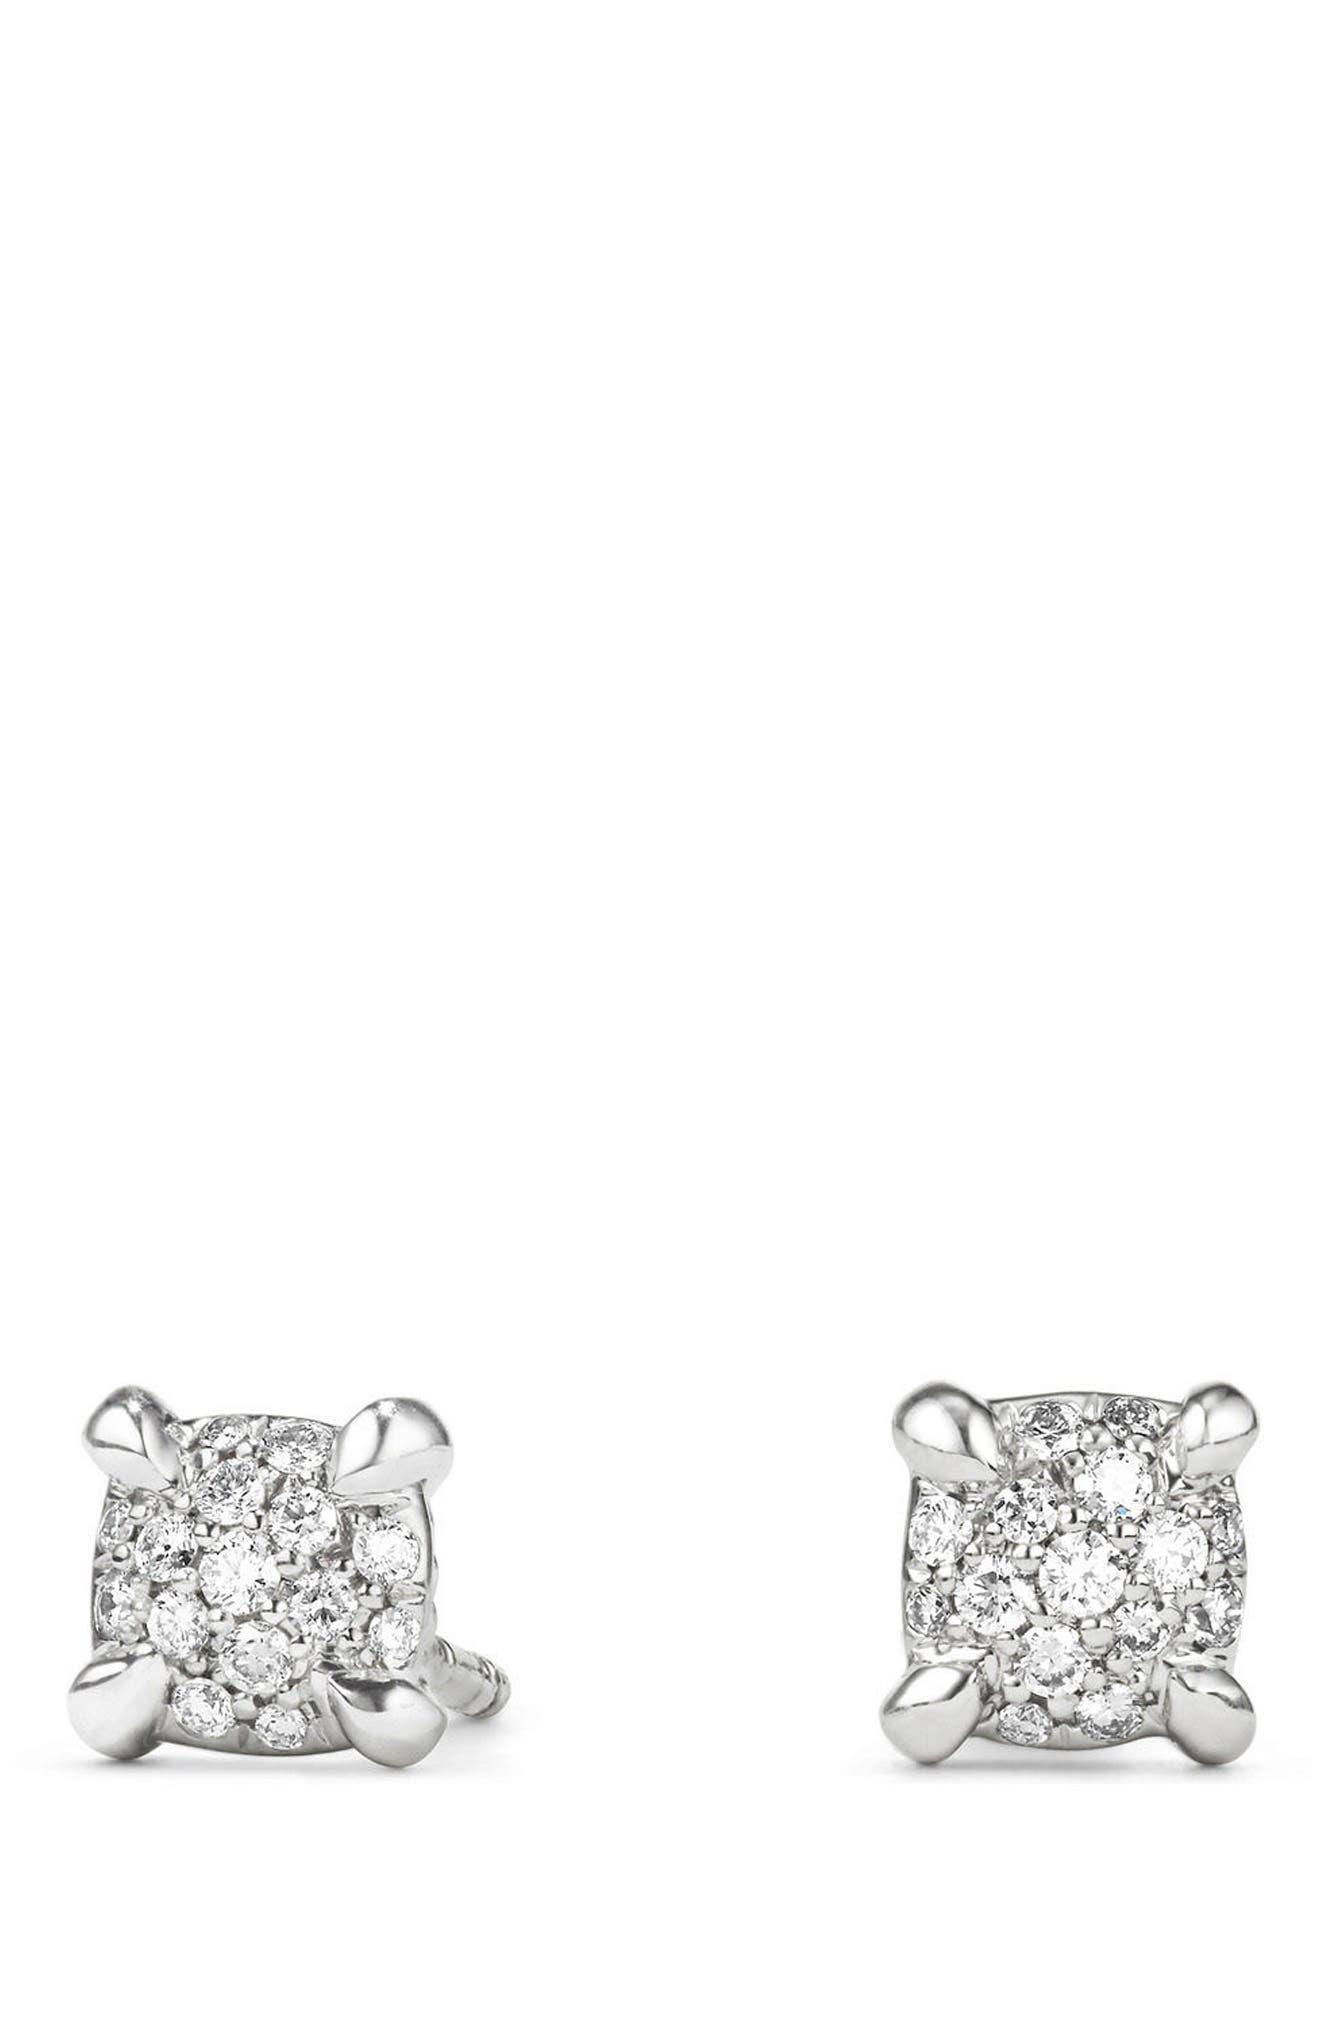 Châtelaine Stud Earrings with Diamonds,                             Main thumbnail 1, color,                             710